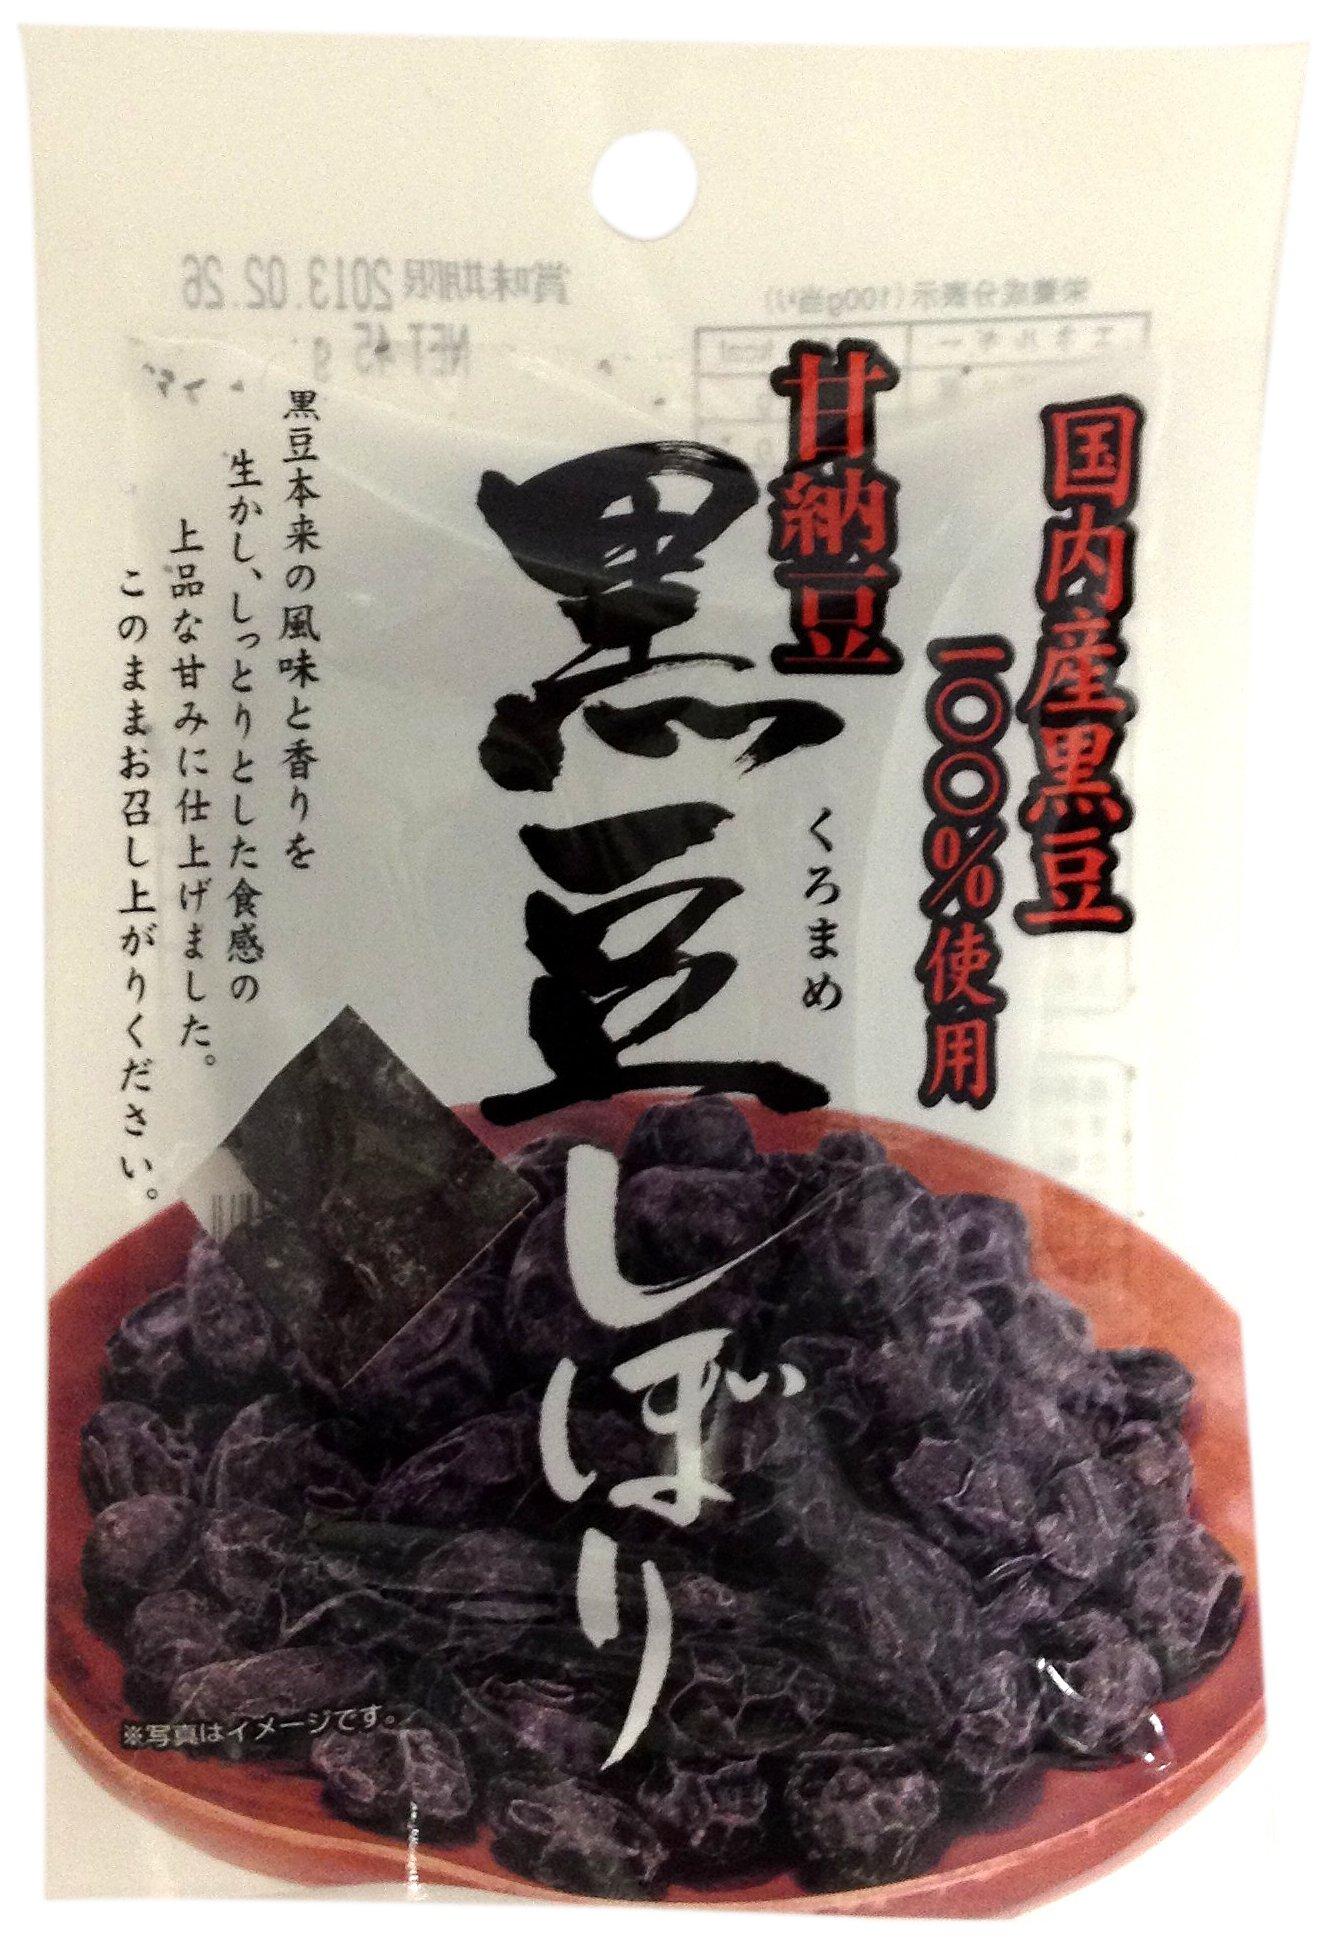 Kimura Foods domestic black bean squeezed Amanatto 45gX15 bags by Kimura Foods